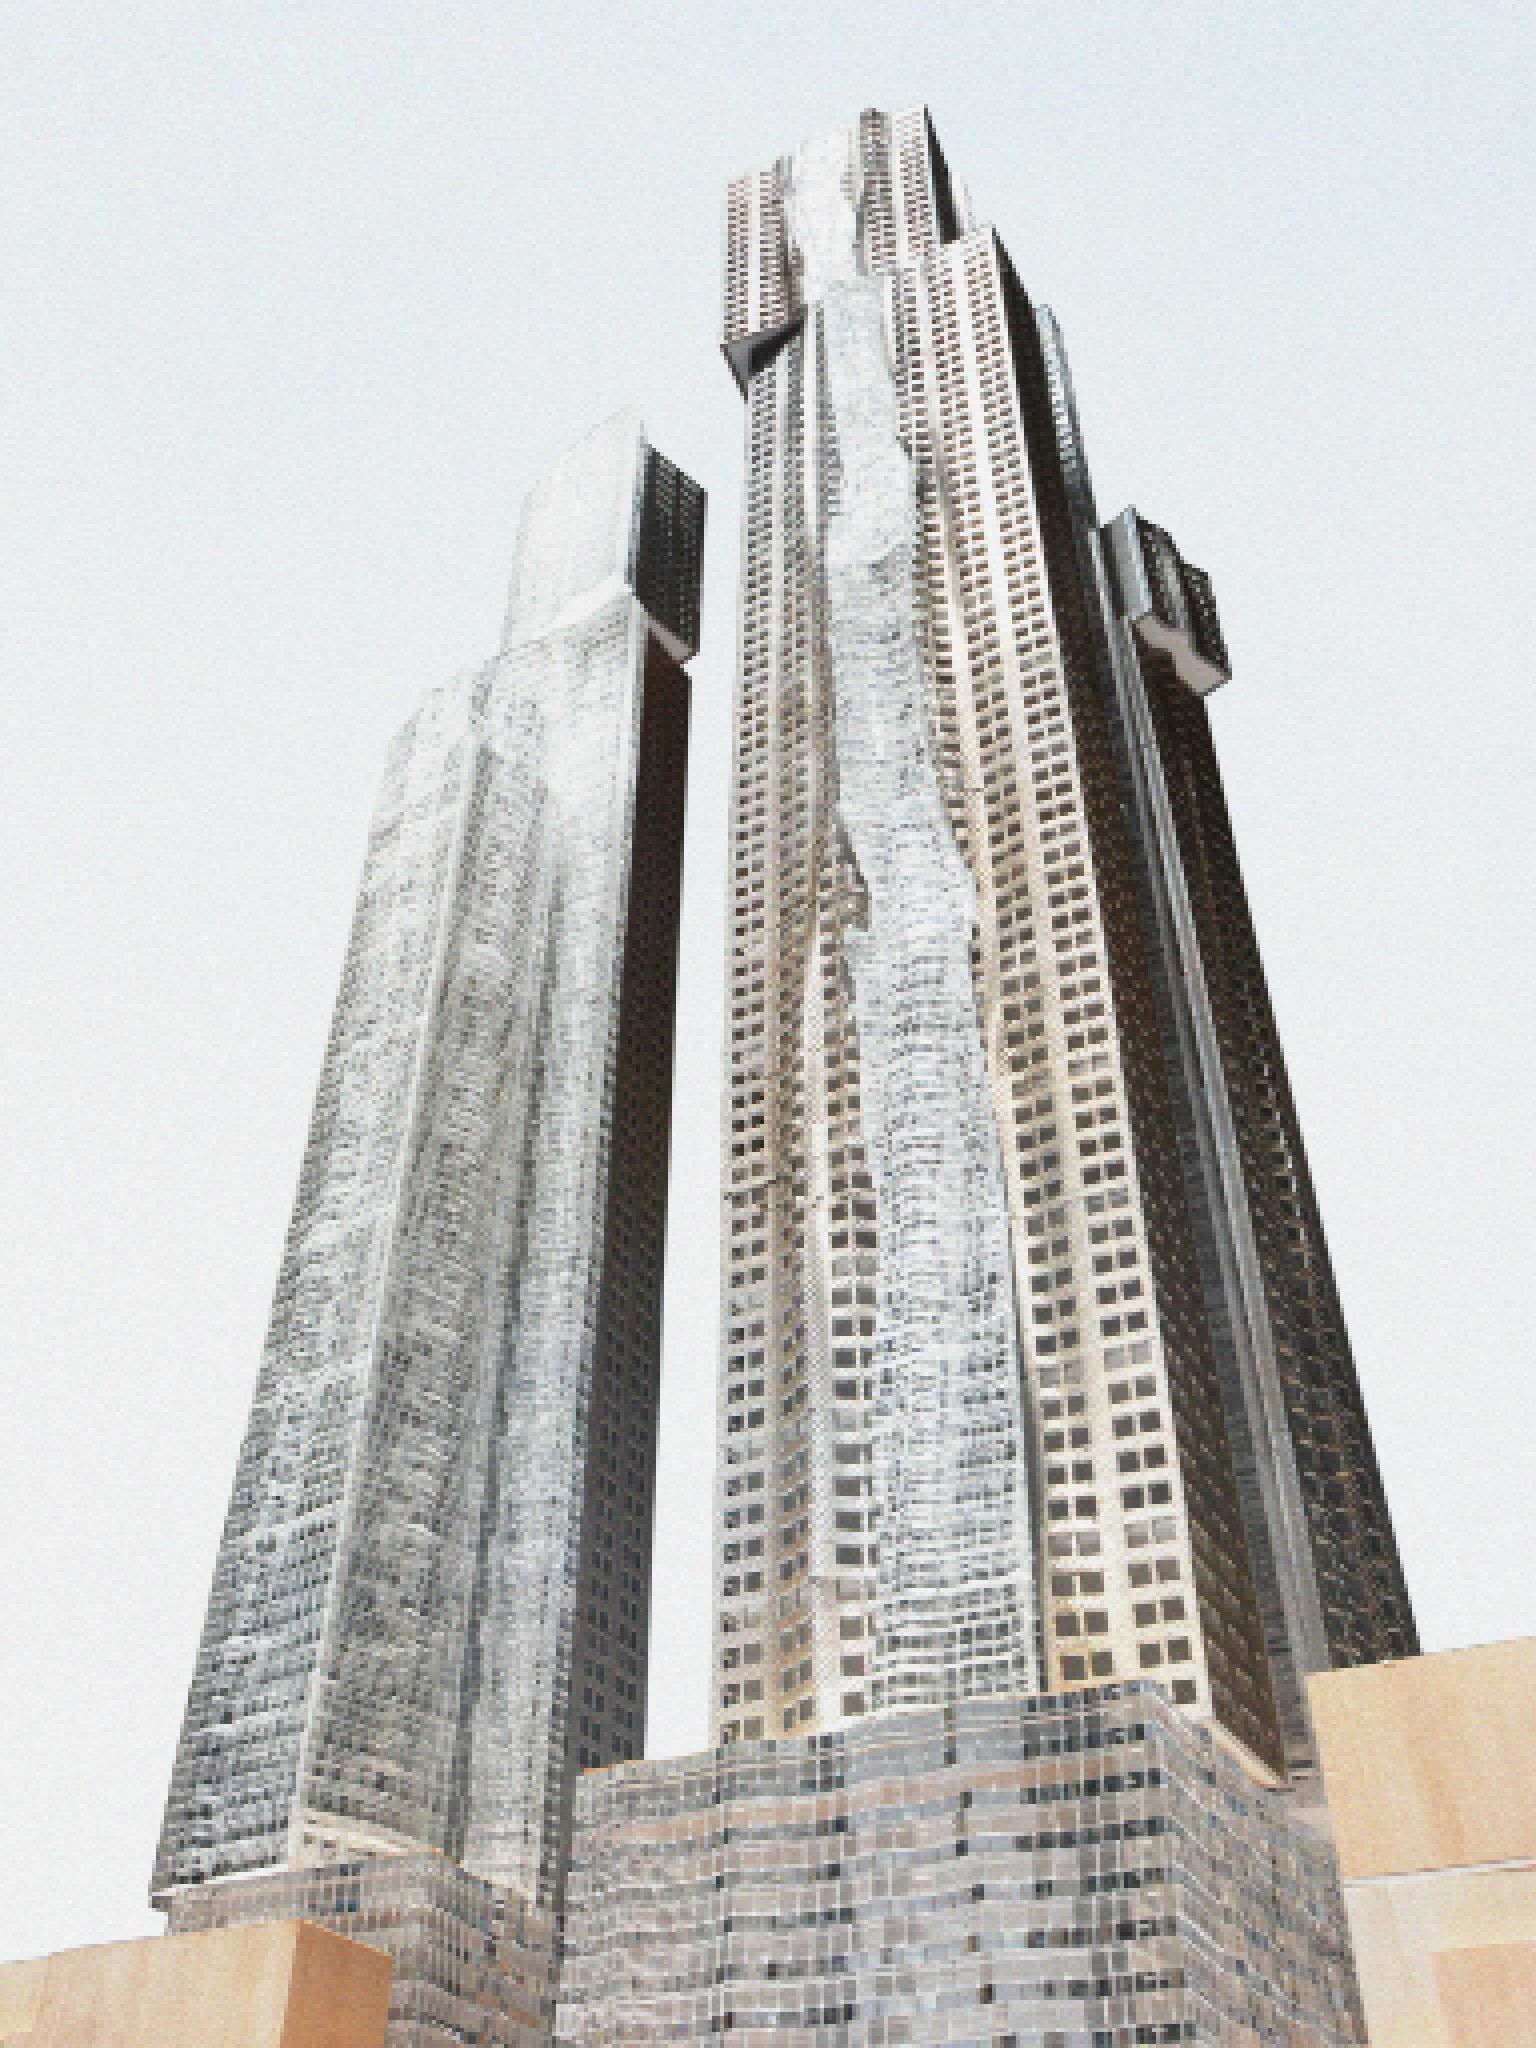 Mirvish+Gehry Toronto Condos Building View Toronto, Canada